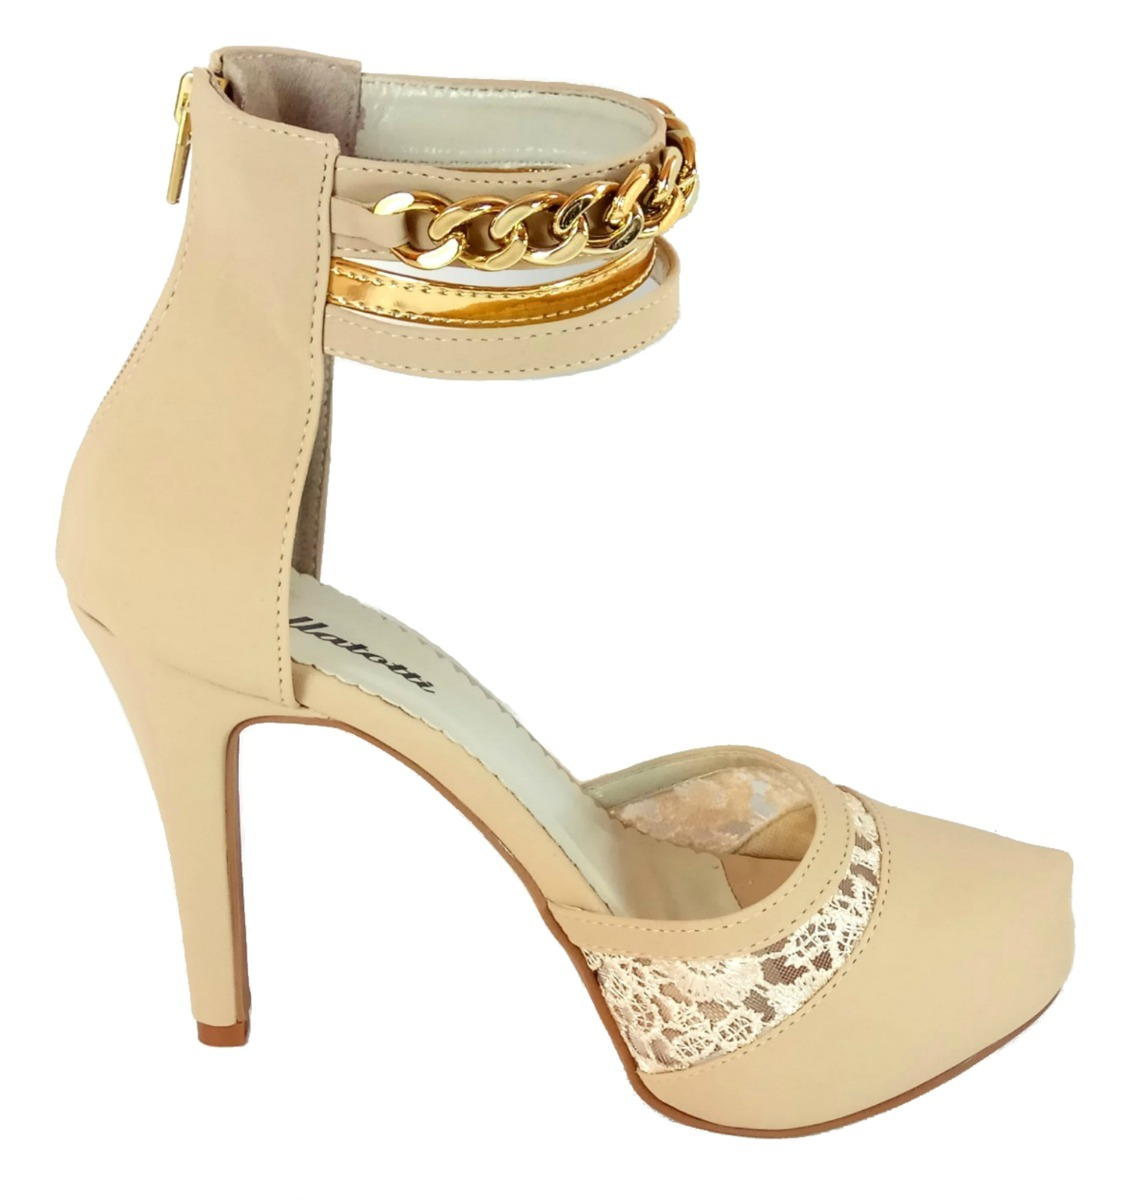 093d2fdfe4 sandalia feminina social salto alto fino festa casamento. Carregando zoom.